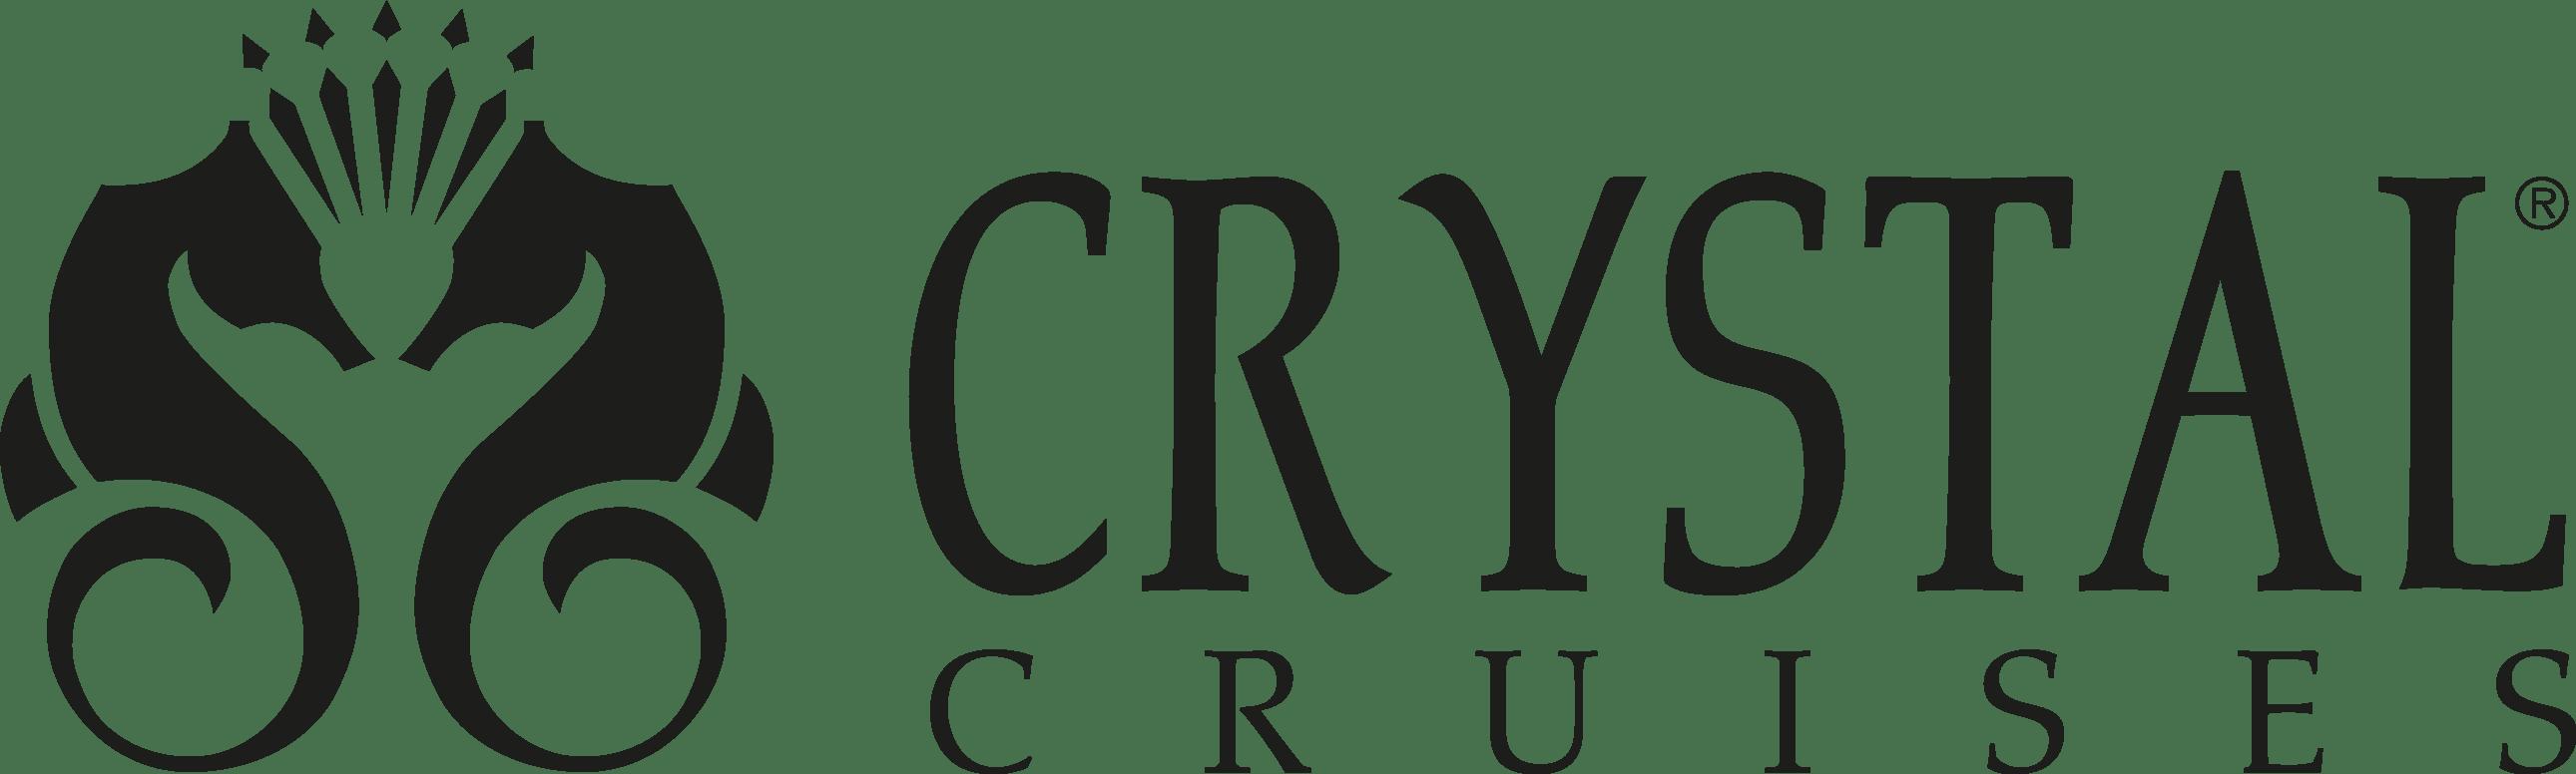 Crystal Cruises Logo png